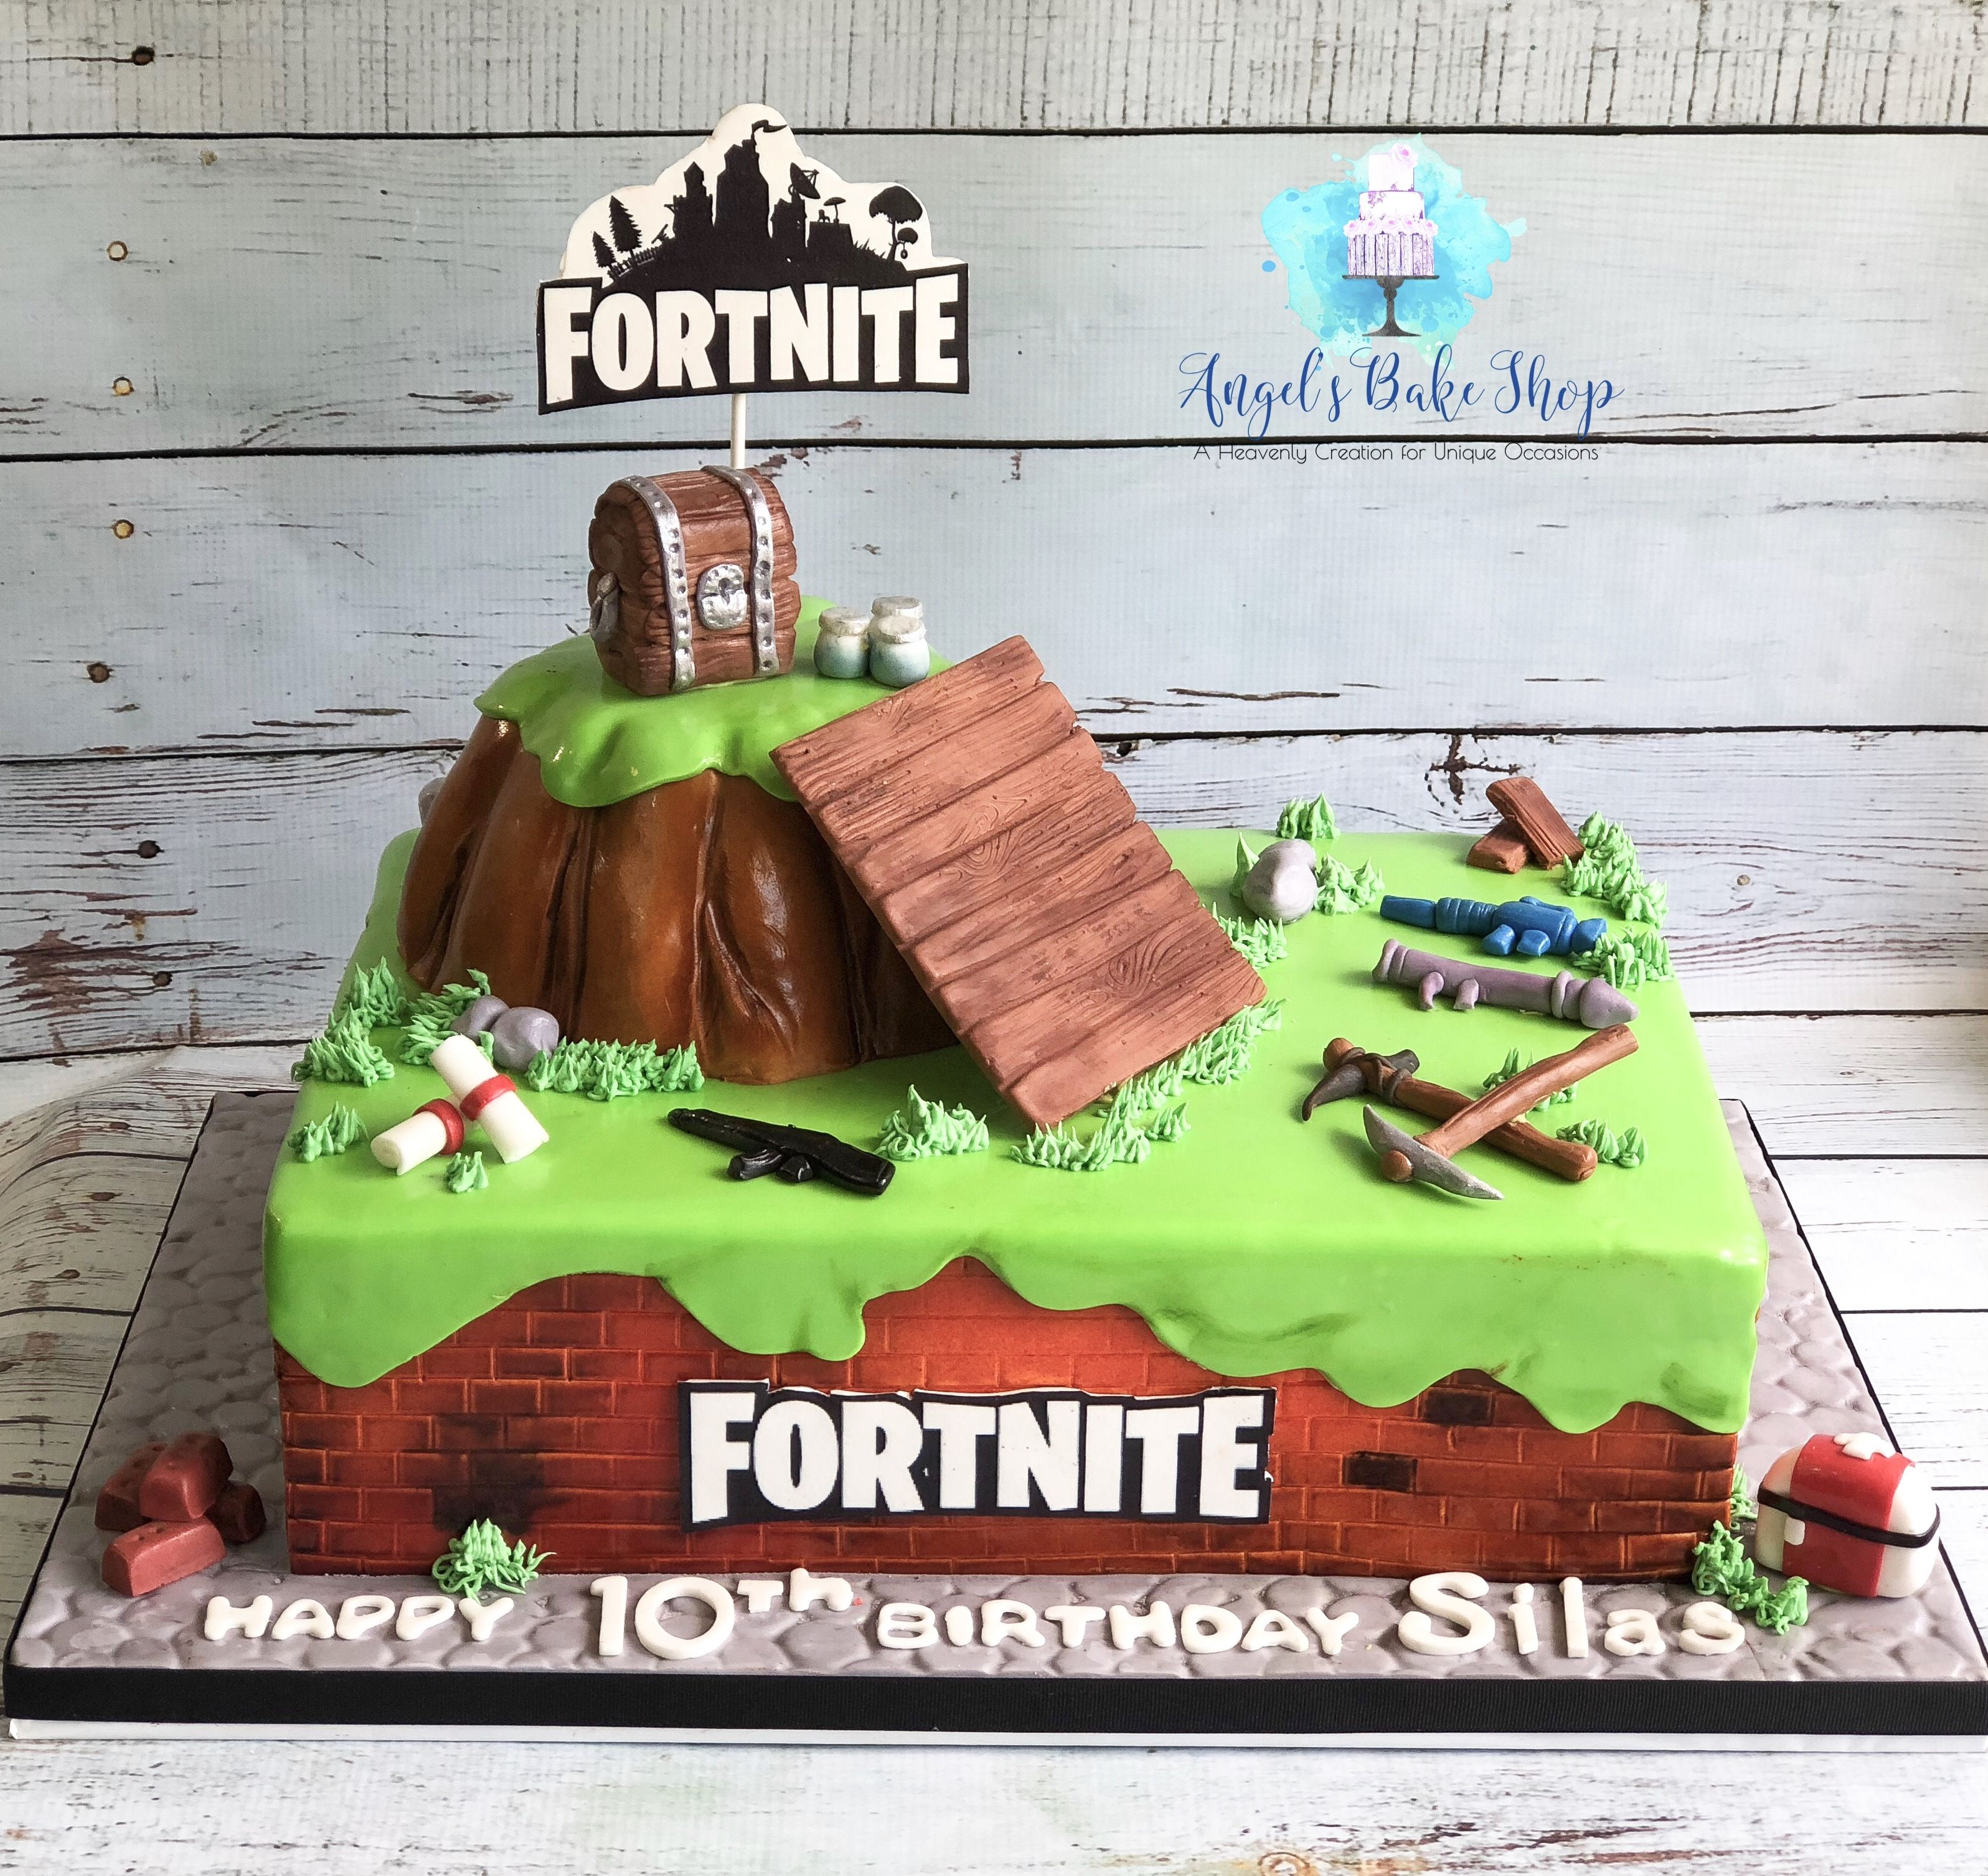 Fortnite Leckeres Essen Geburtstagskuchen Fur Jungen Kuchen Ideen